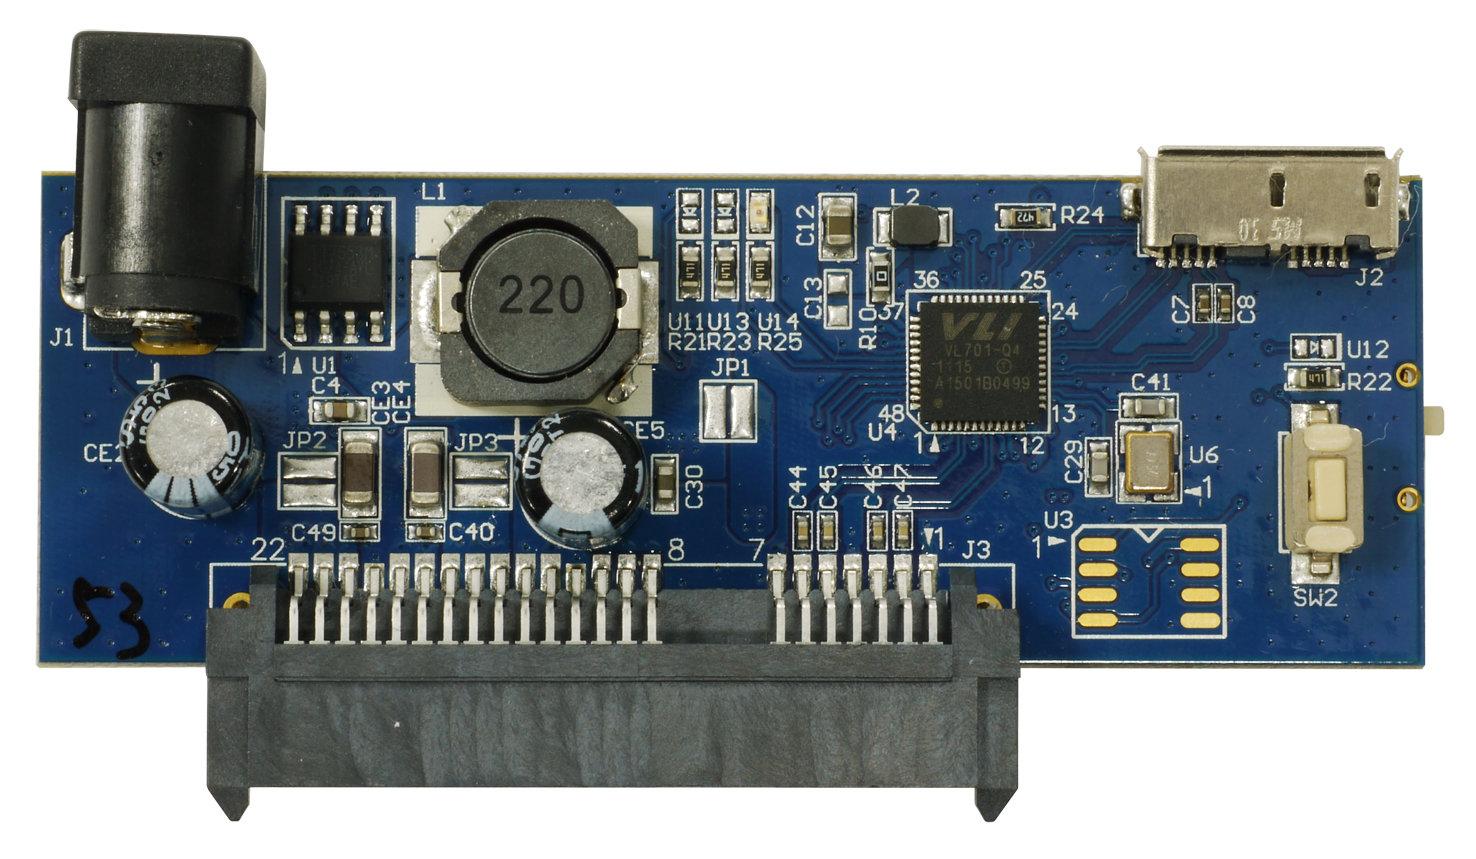 VIA VL701 USB 3.0-SATA Demo Card